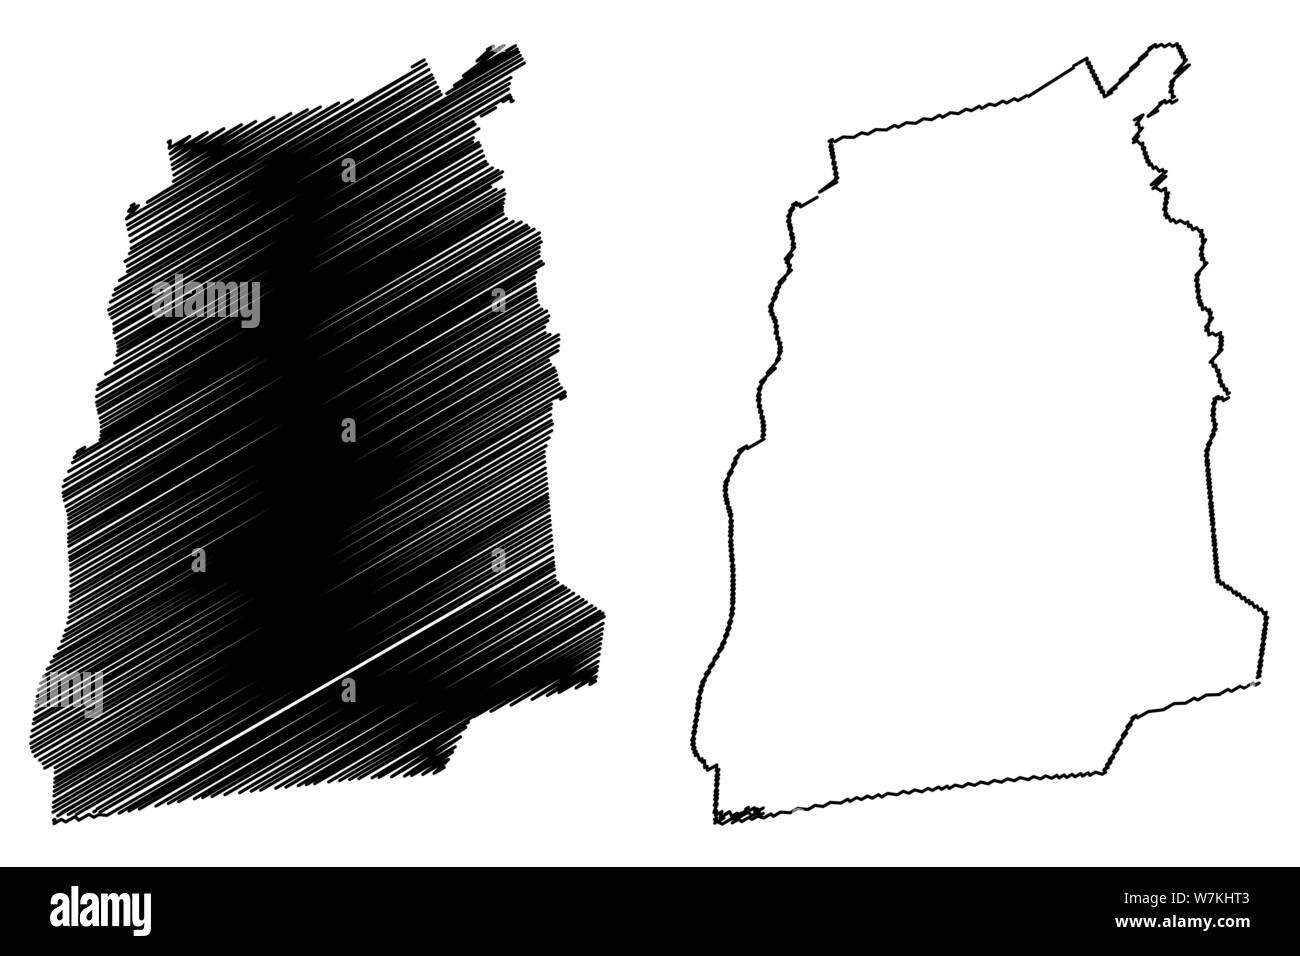 Atlantique Department (Departments of Benin, Republic of Benin, Dahomey) map vector illustration, scribble sketch Atlantique map Stock Vector